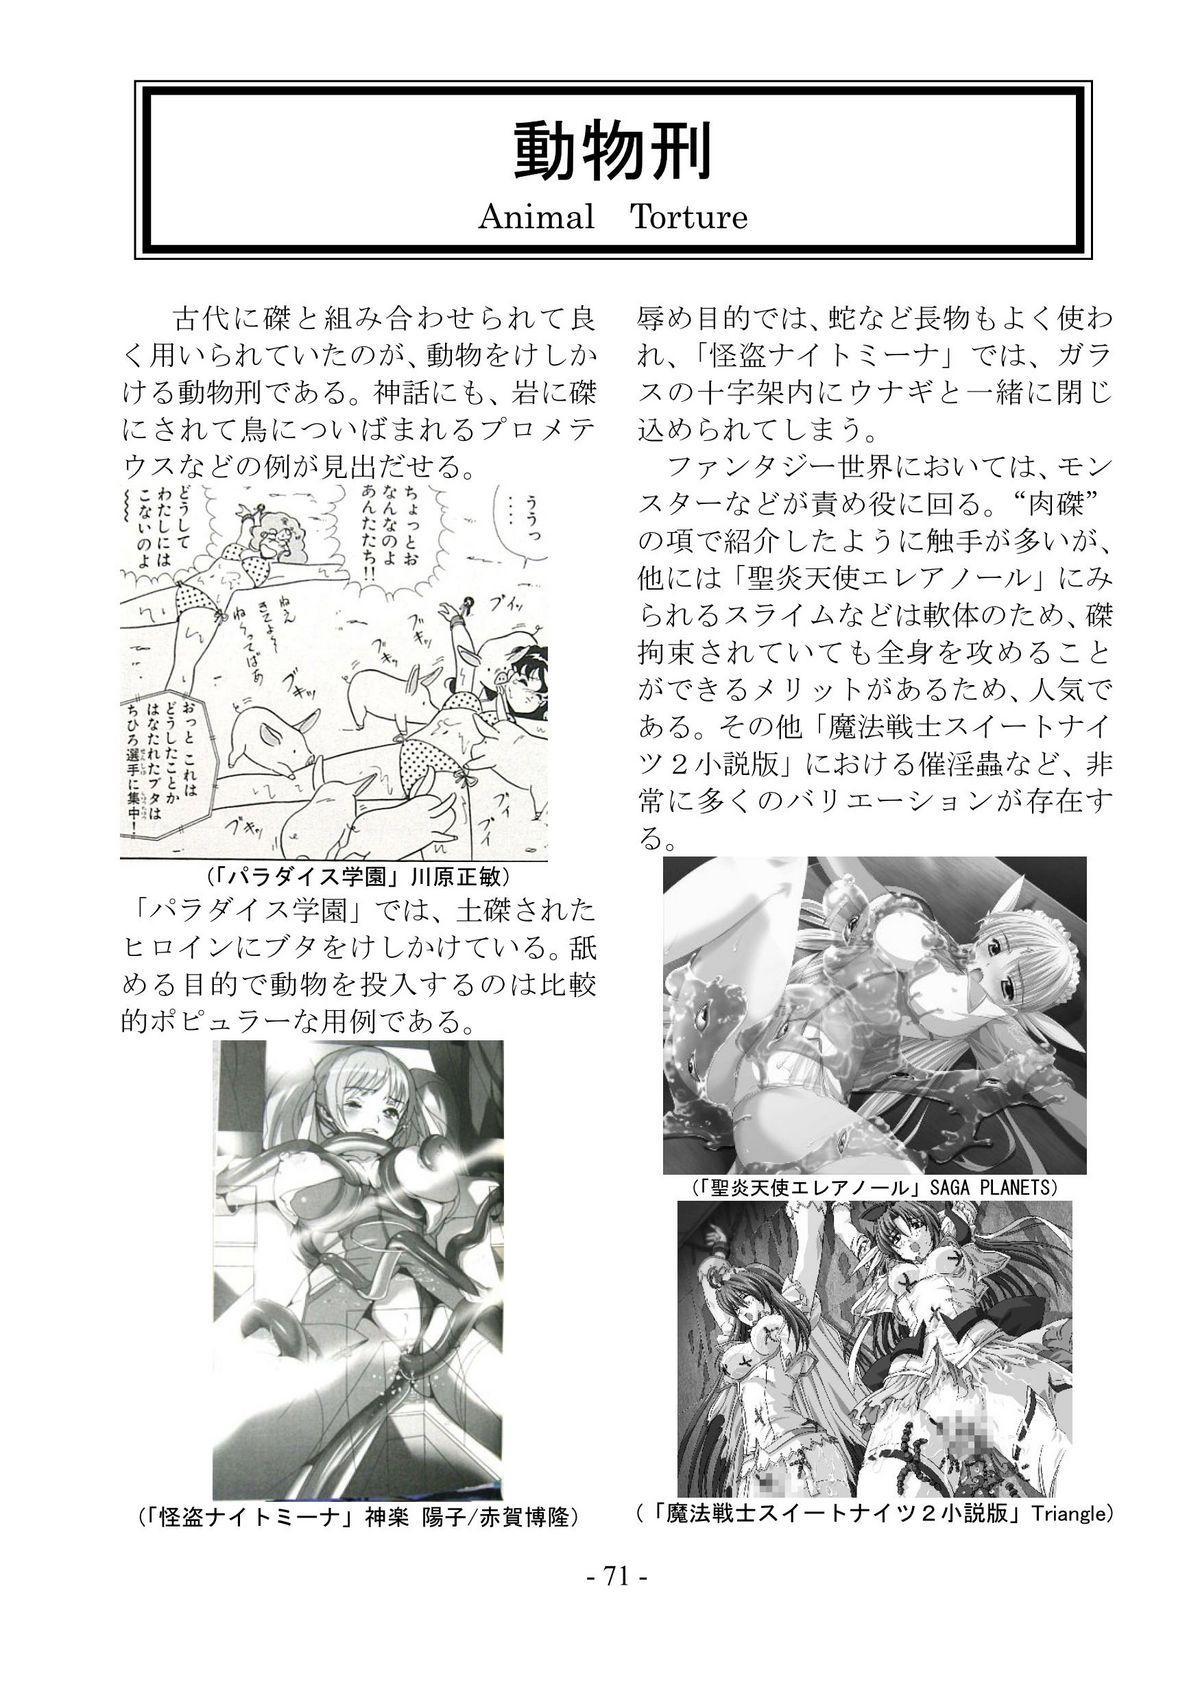 encyclopedia of crucifixion 71